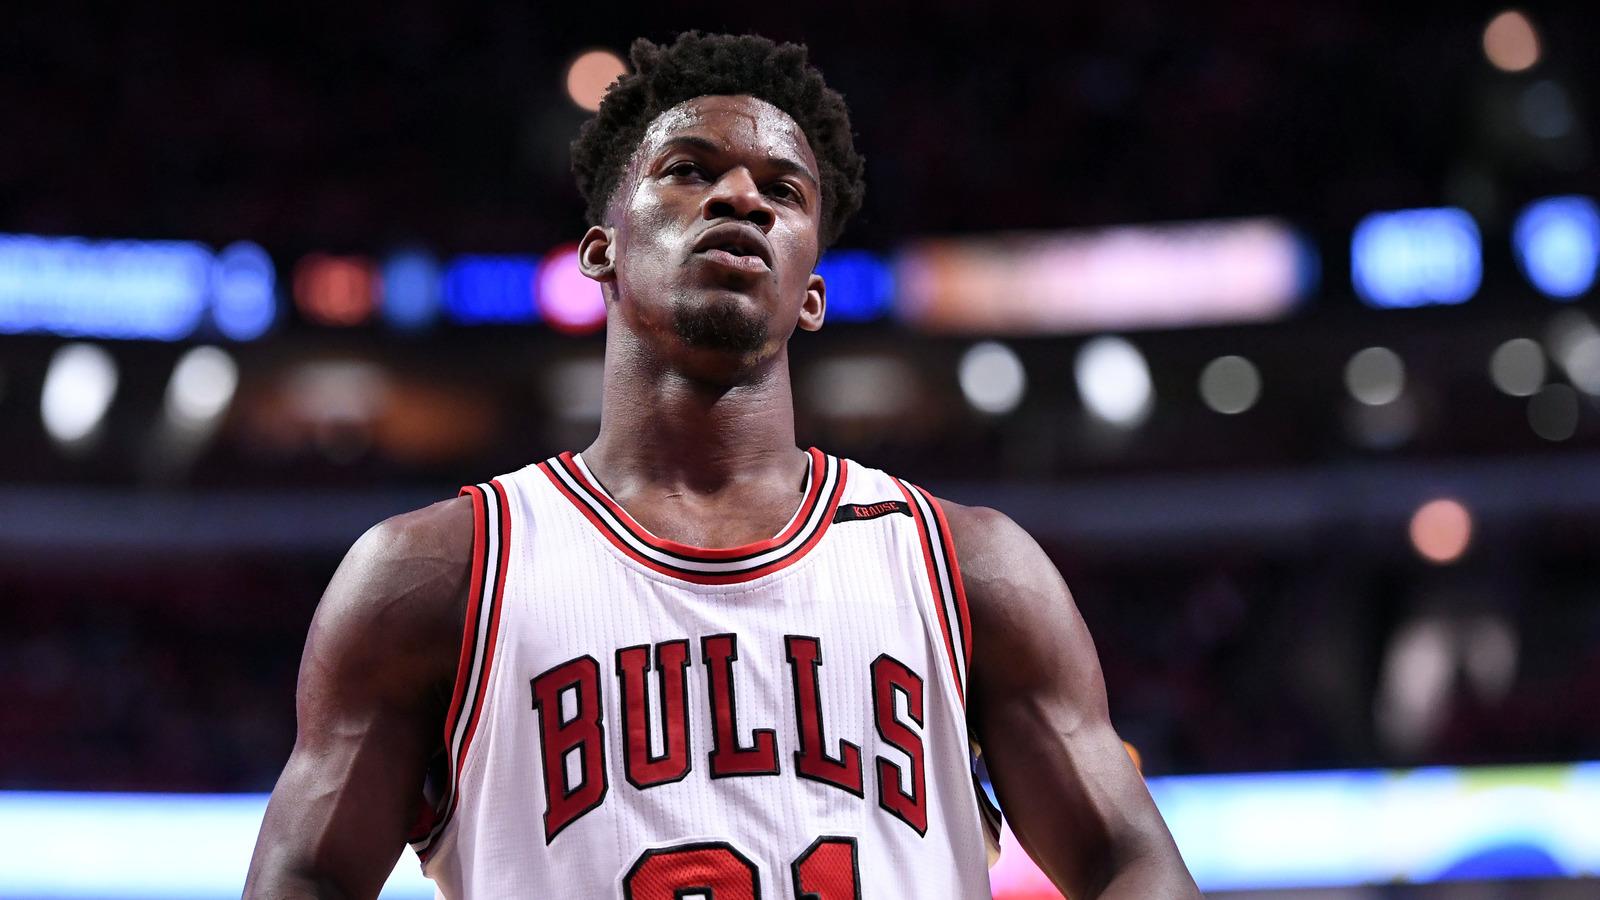 Report Bulls trade Jimmy Butler to Minnesota for Zach LaVine